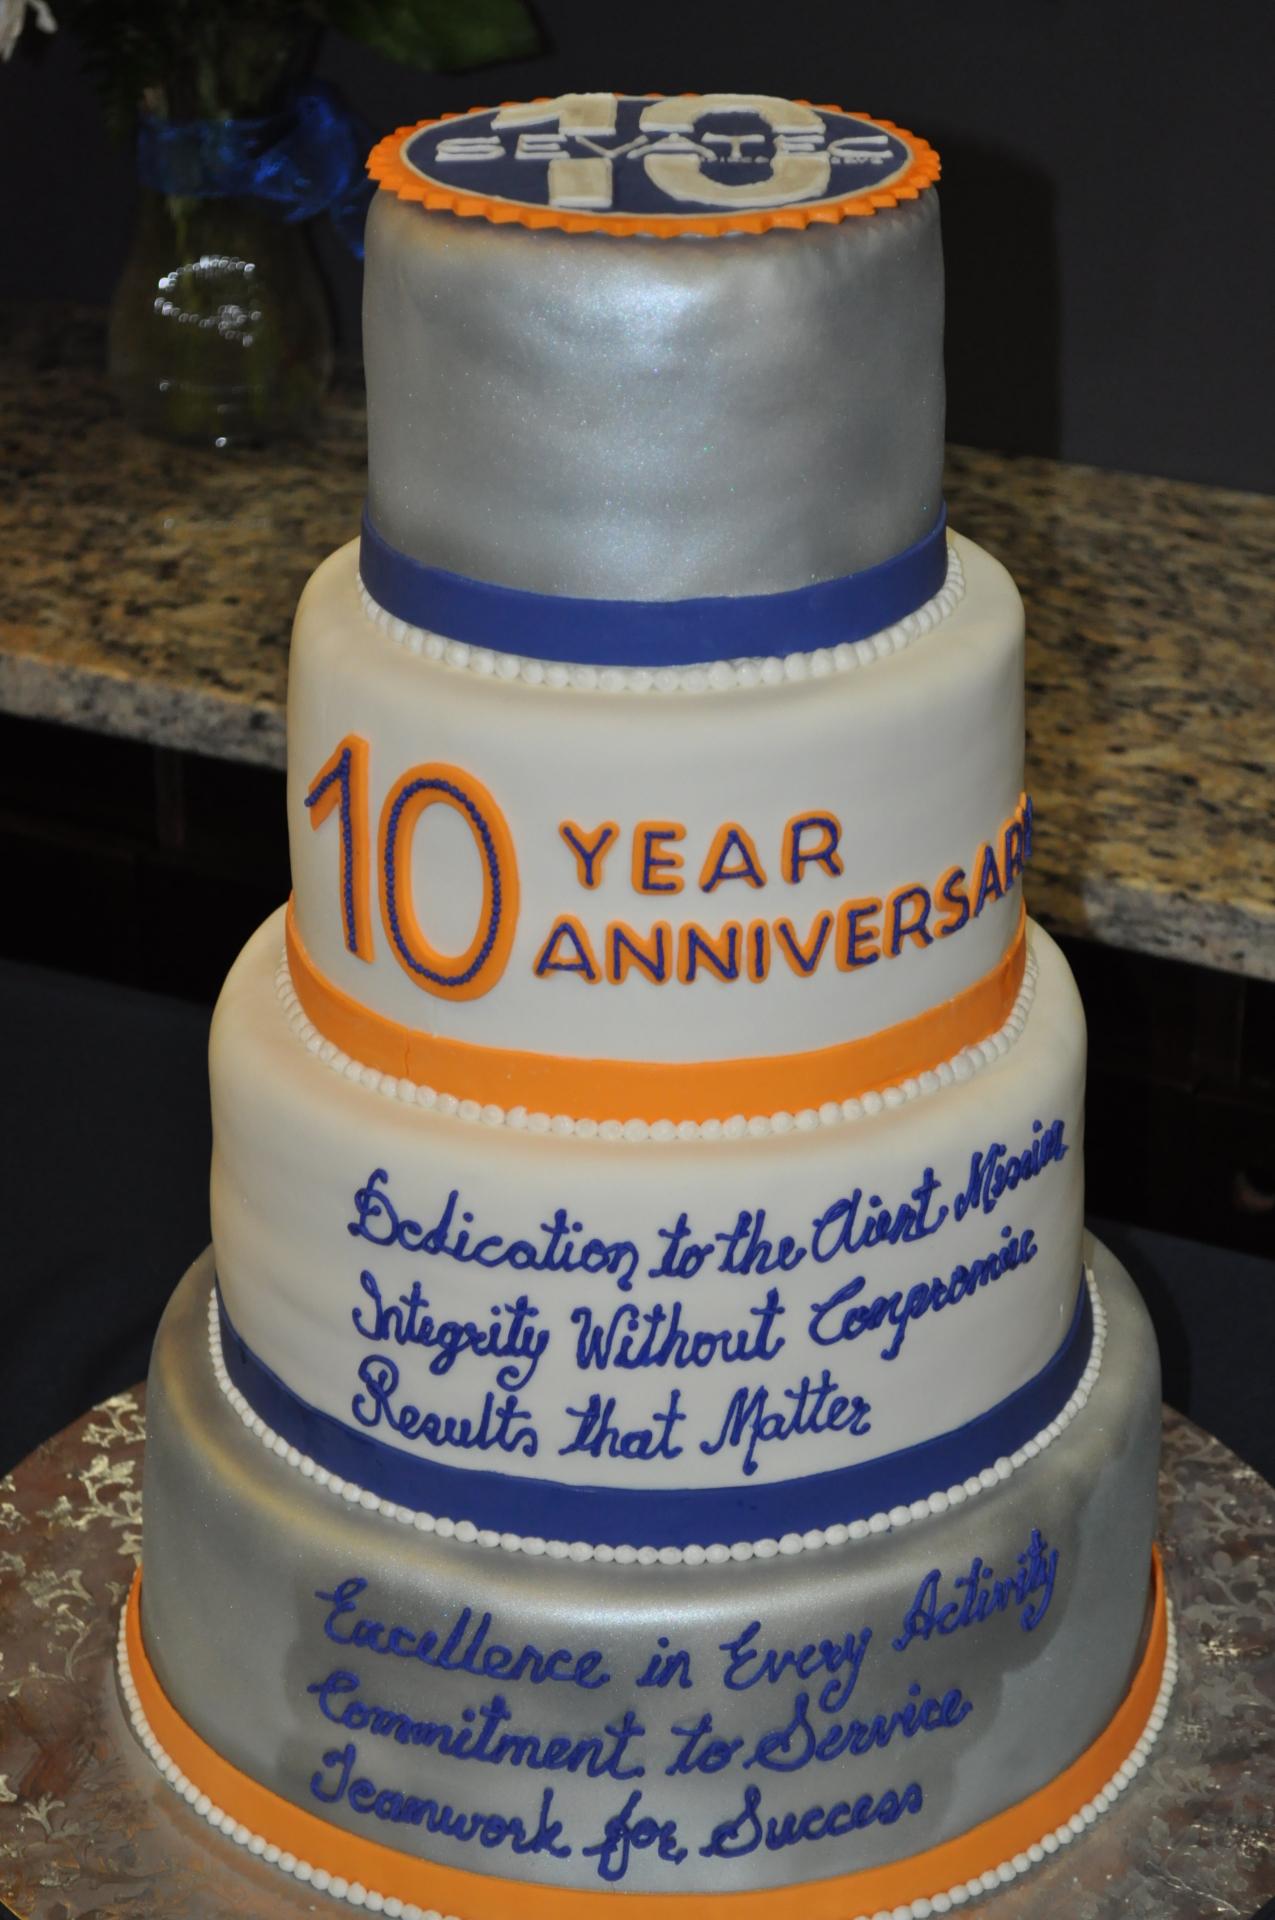 10th anniversary cake-Corporate event cake